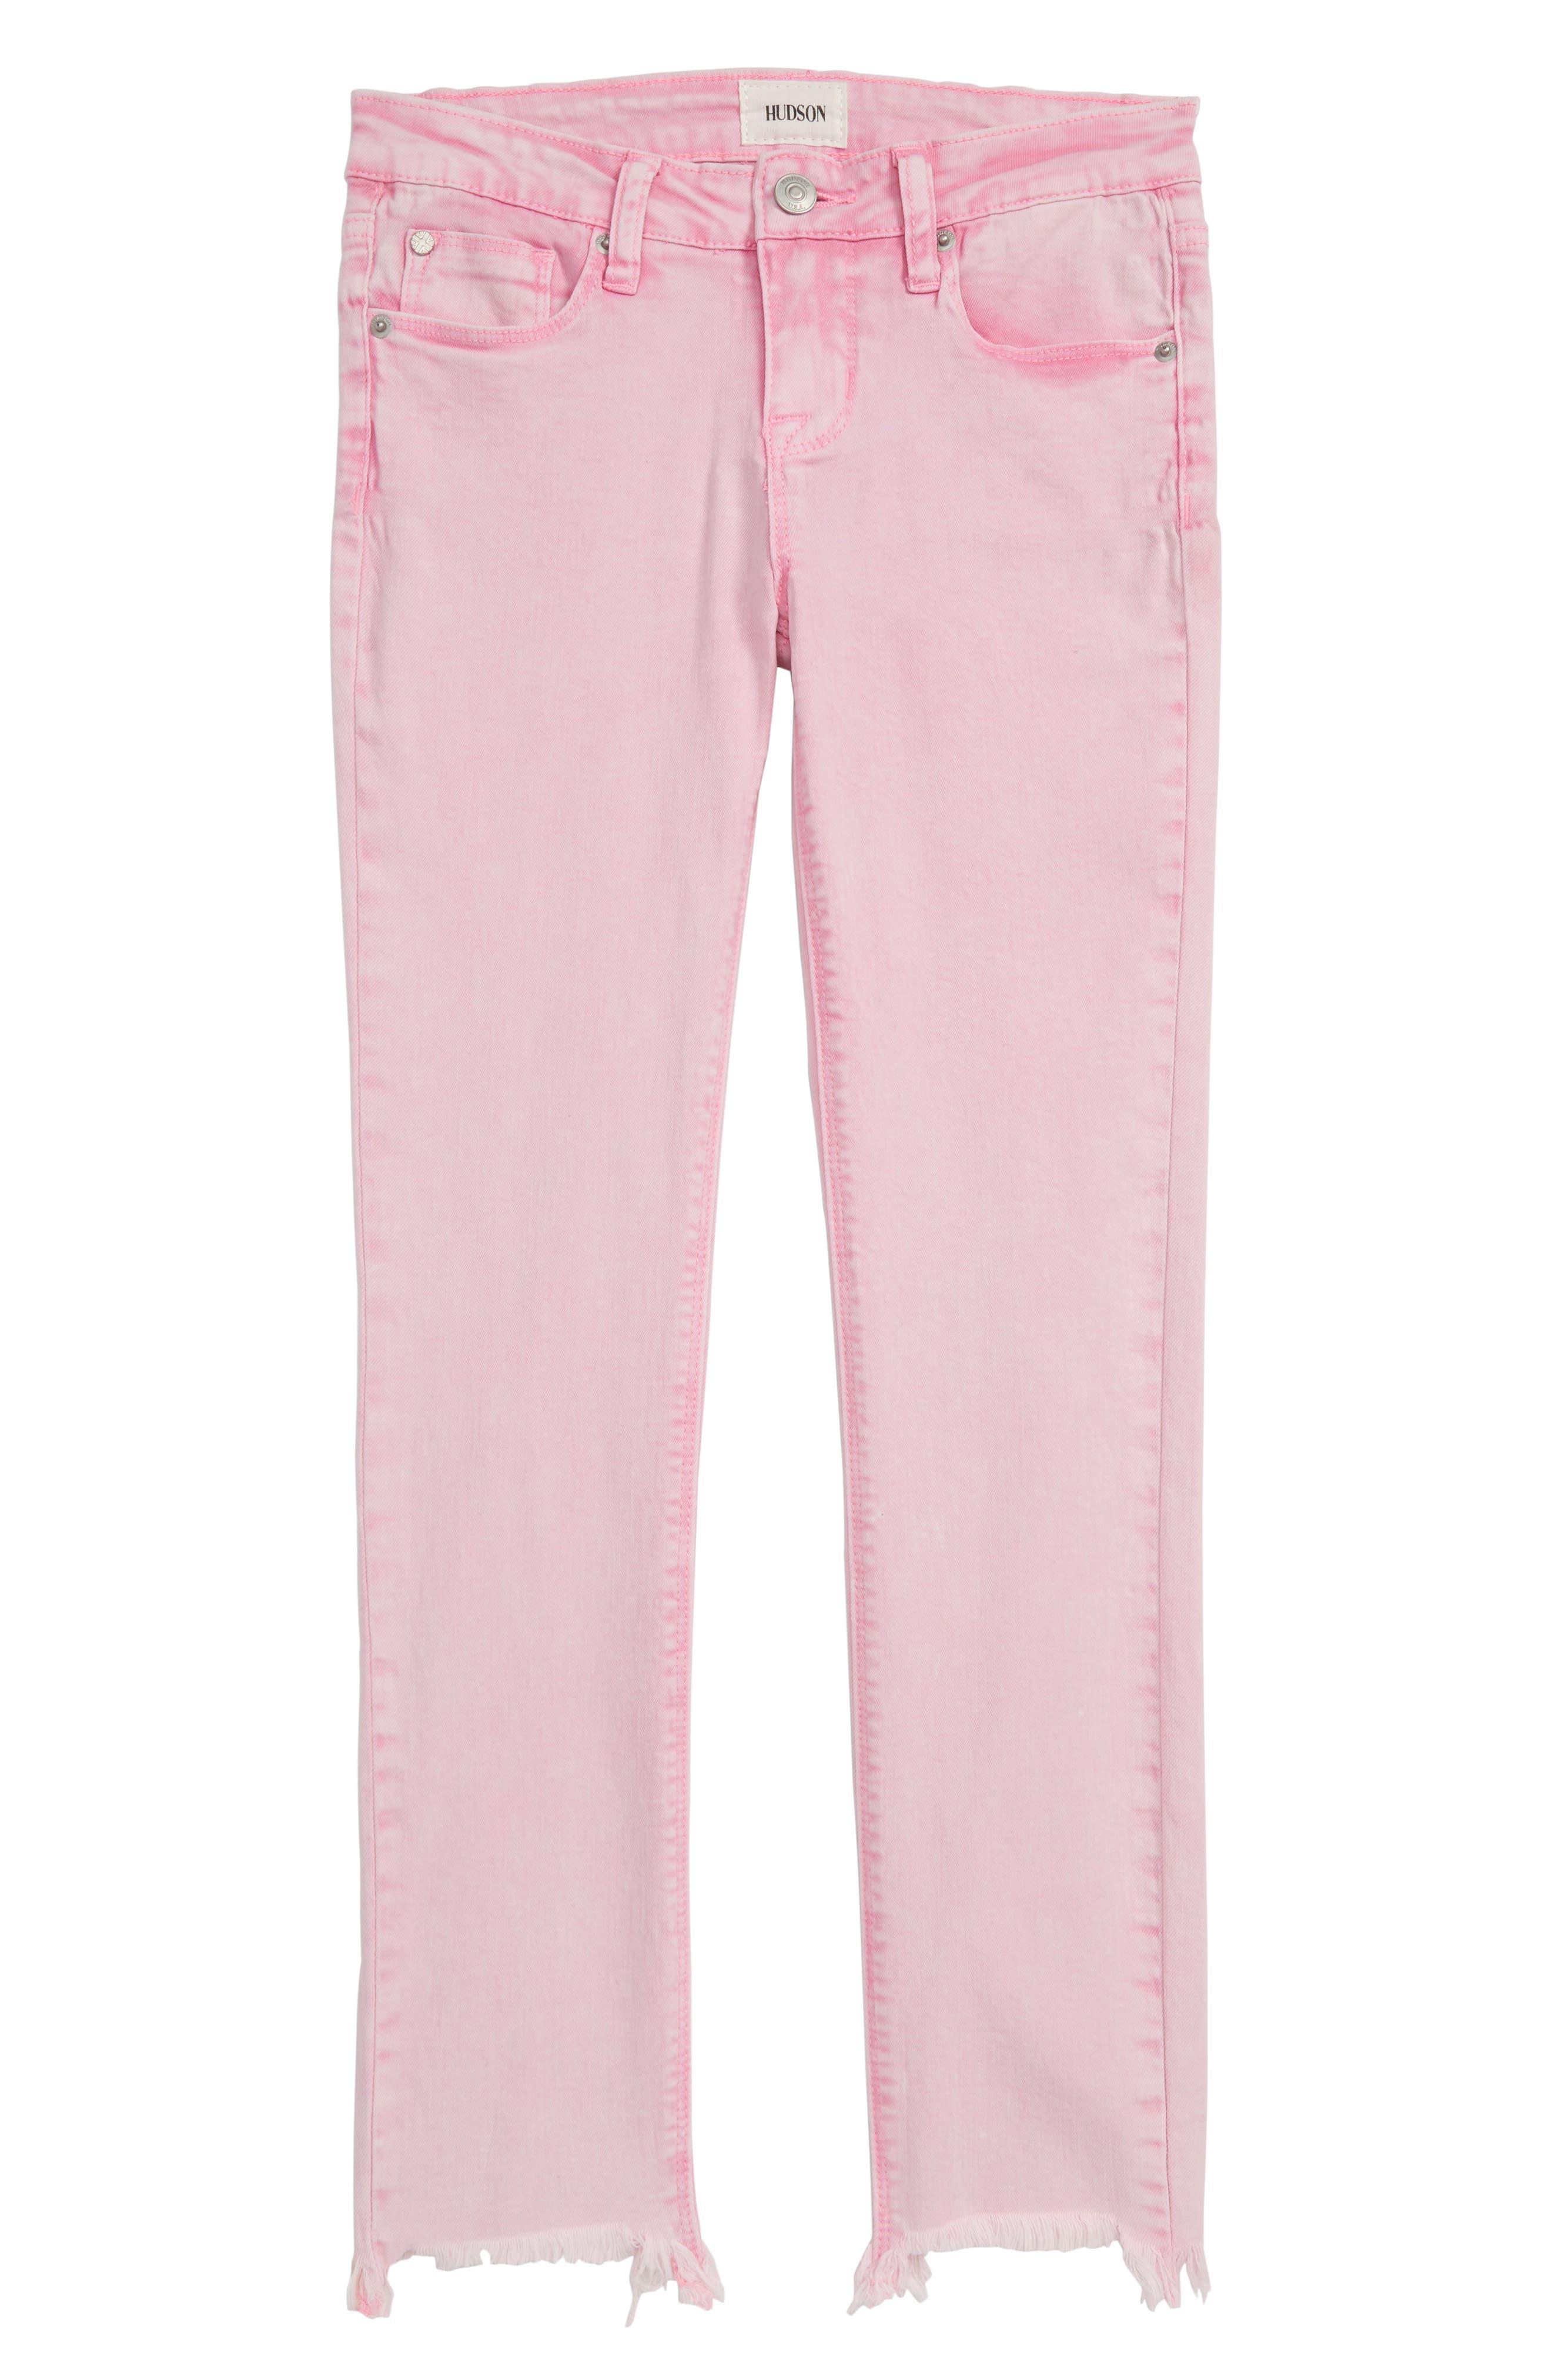 Wren Skinny Jeans,                         Main,                         color, WATERMELON